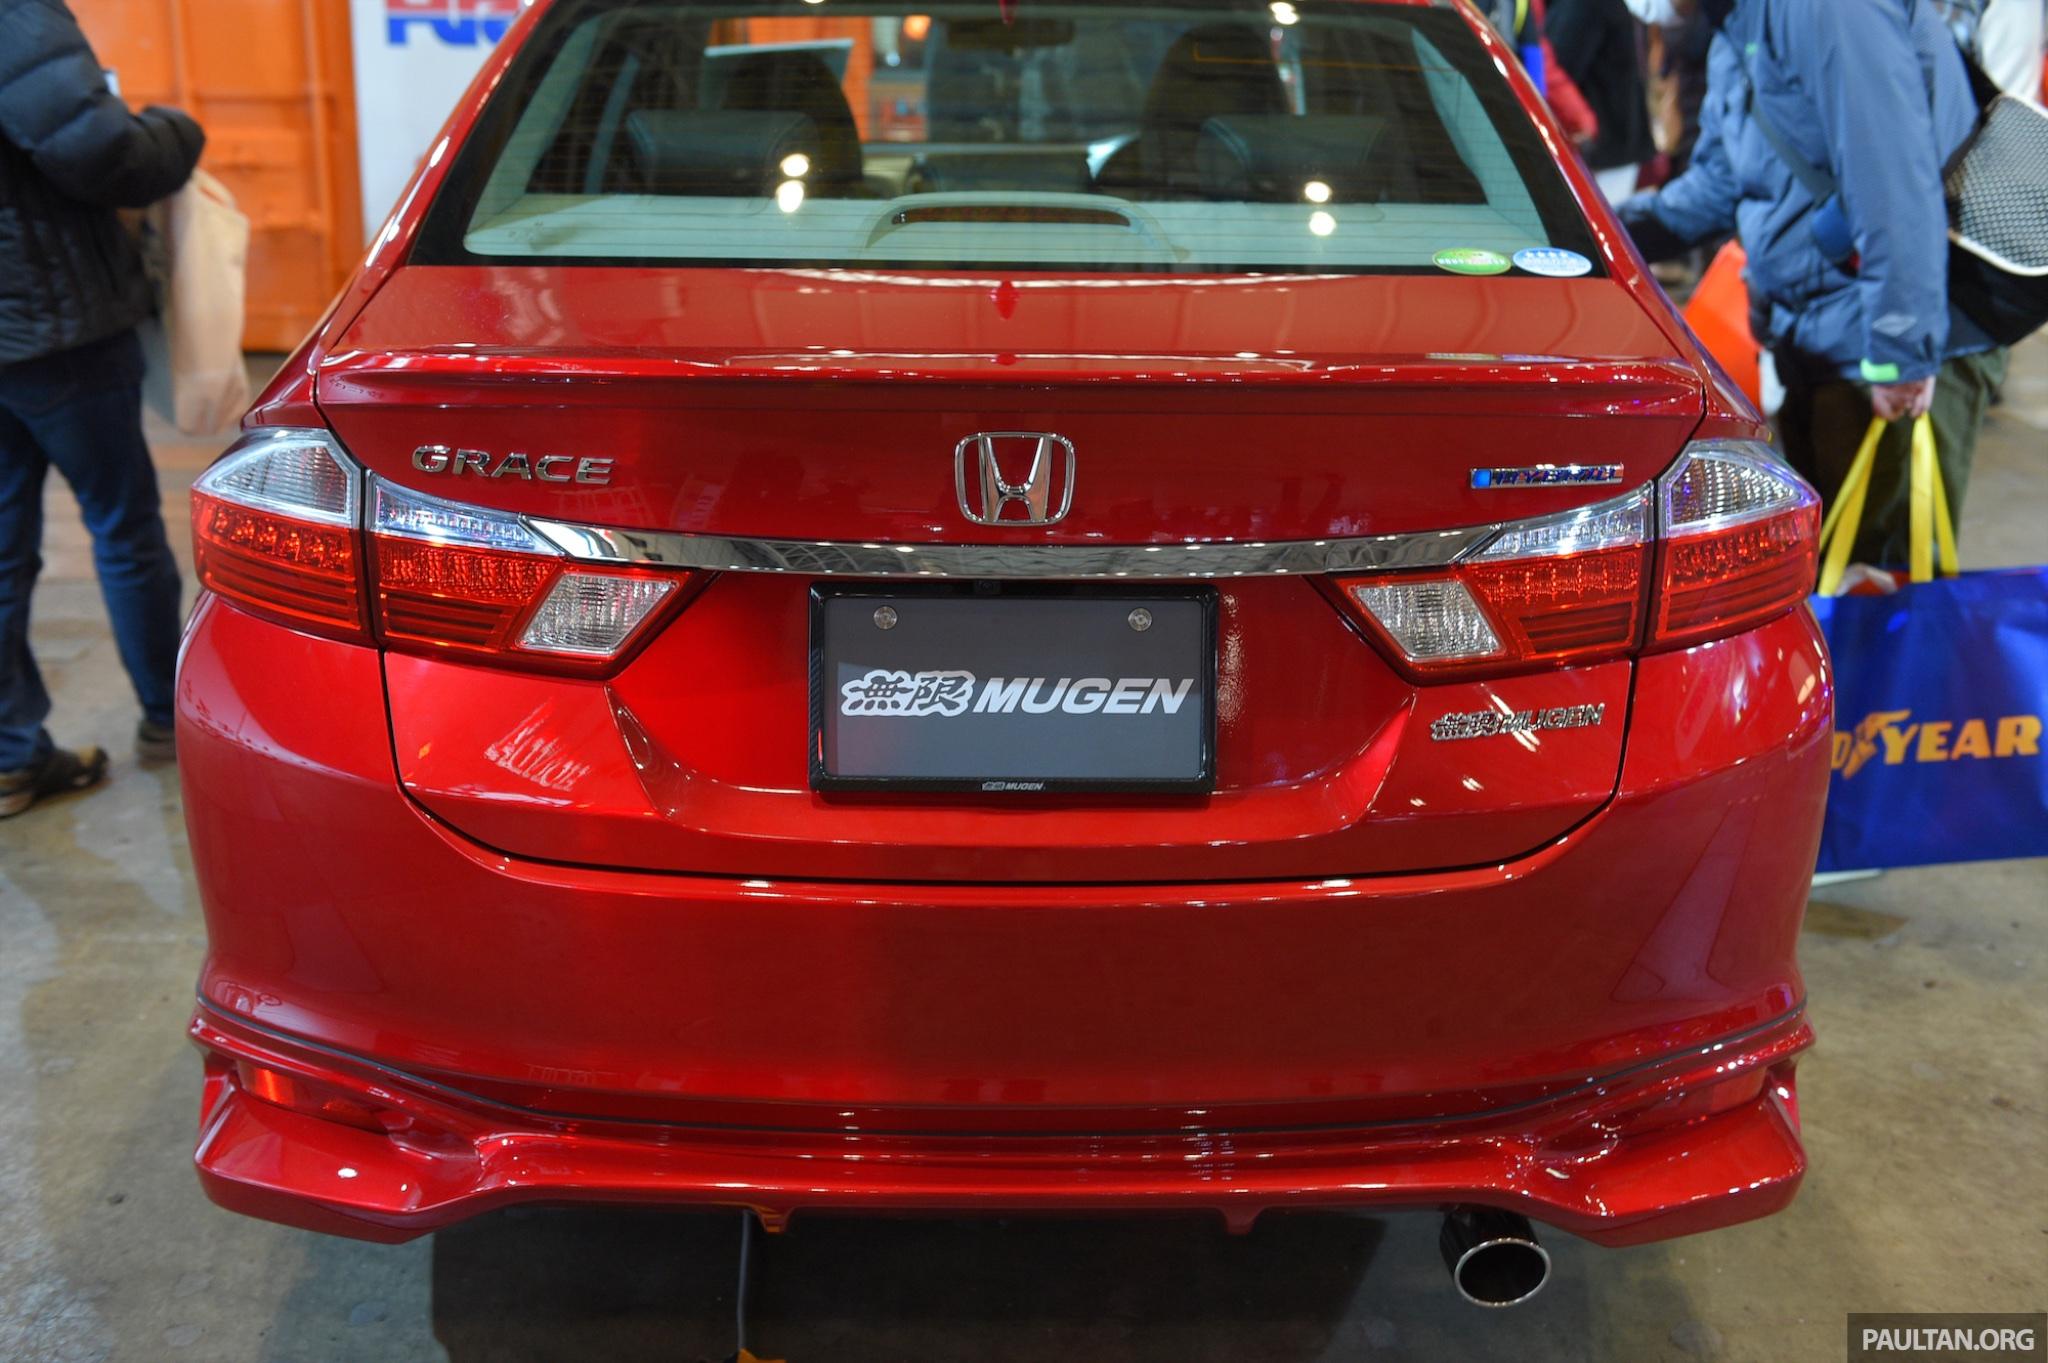 Mugen shows off pimped up Honda Grace (City Hybrid) at ...